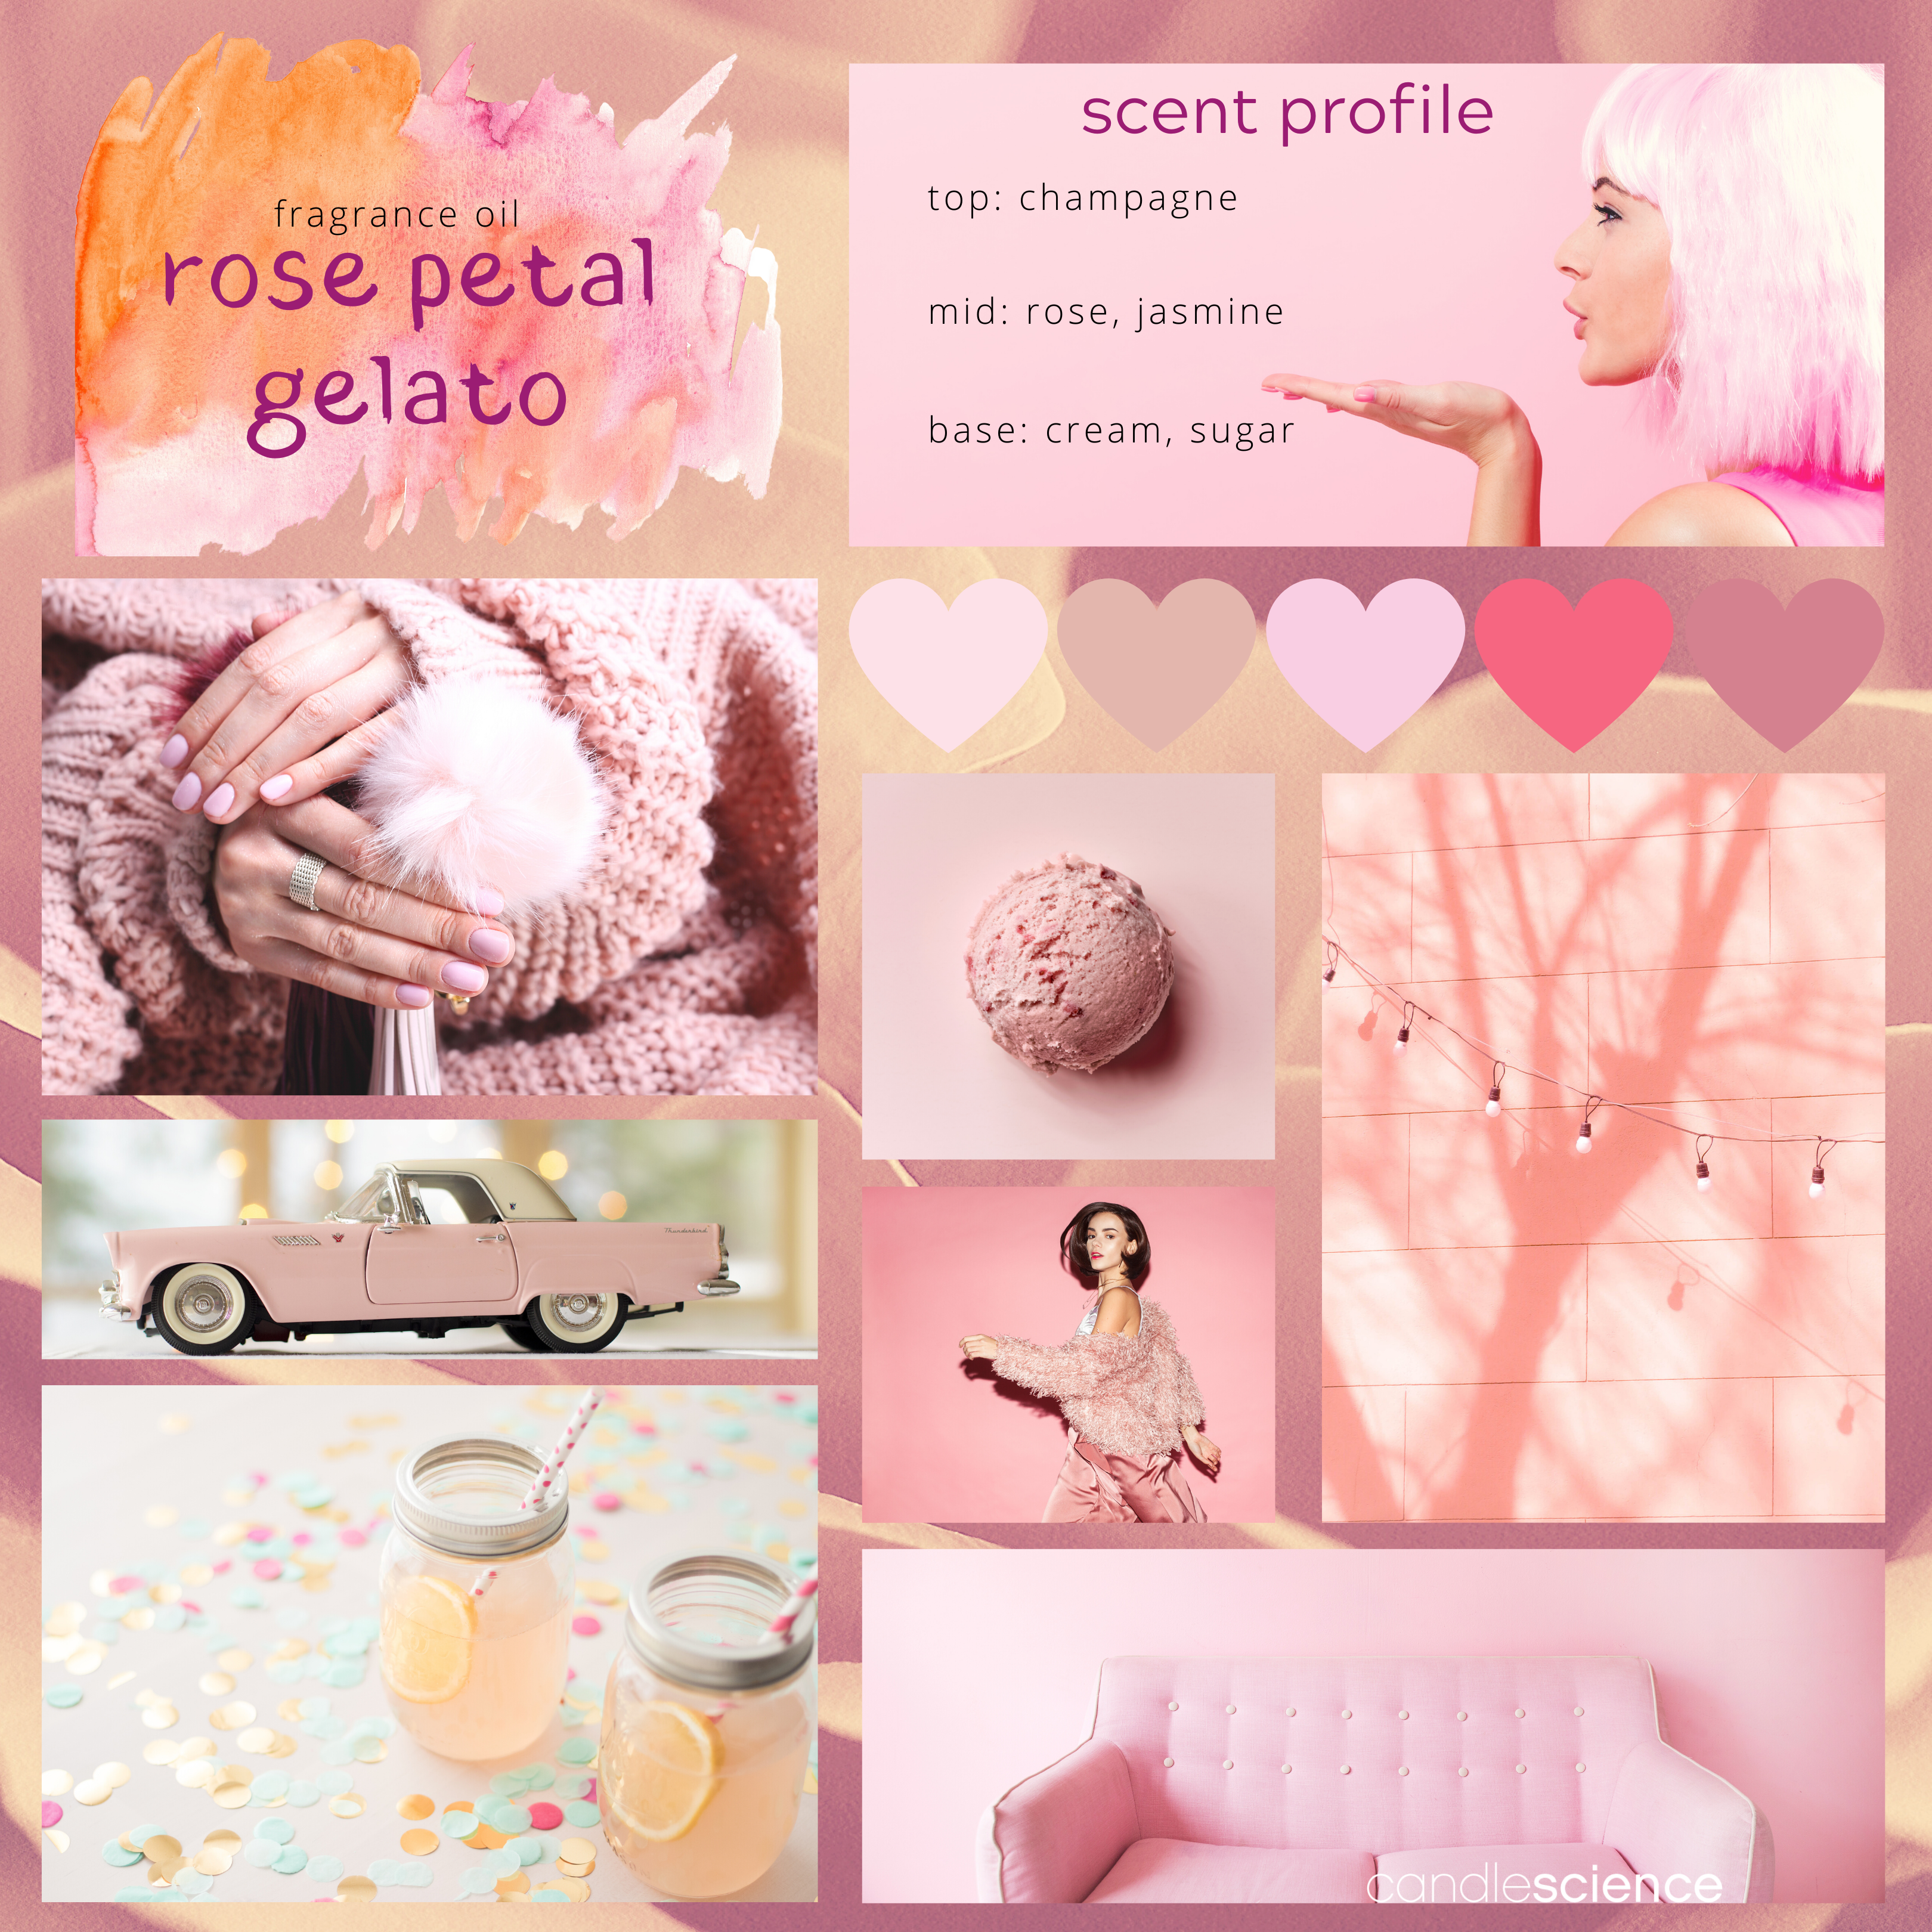 Rose Petal Gelato fragrance oil mood board